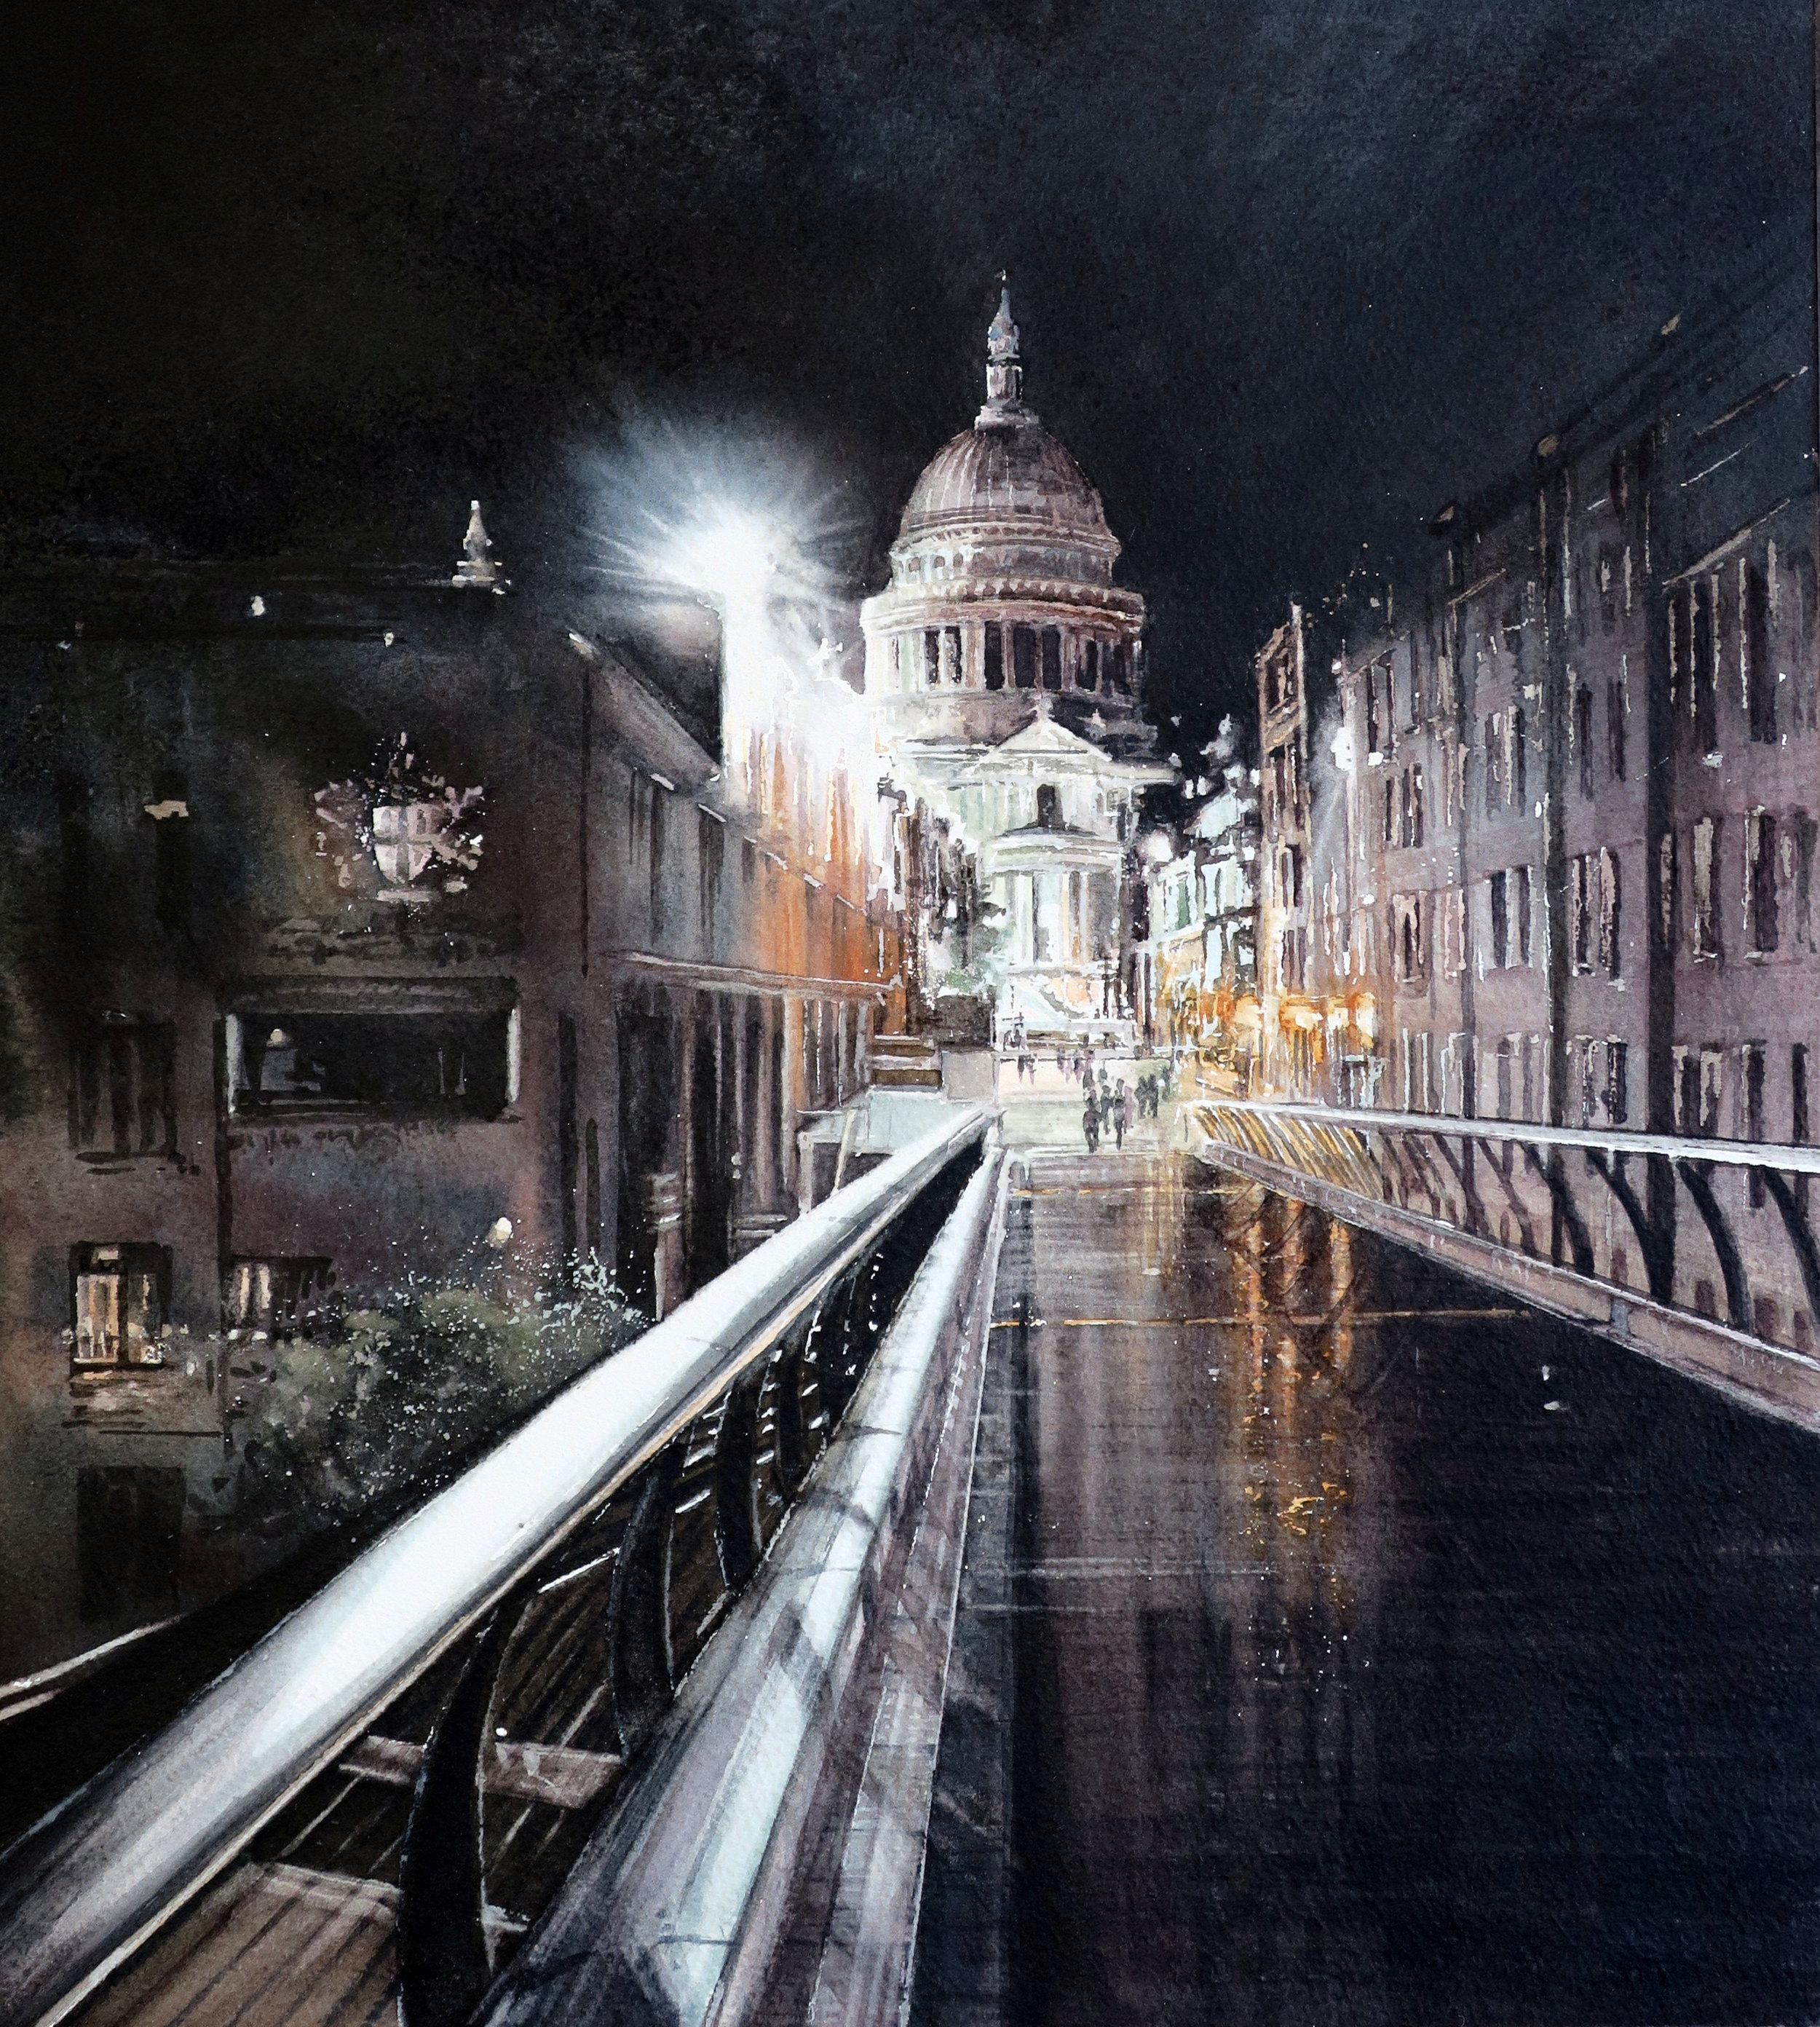 St. Paul's by night